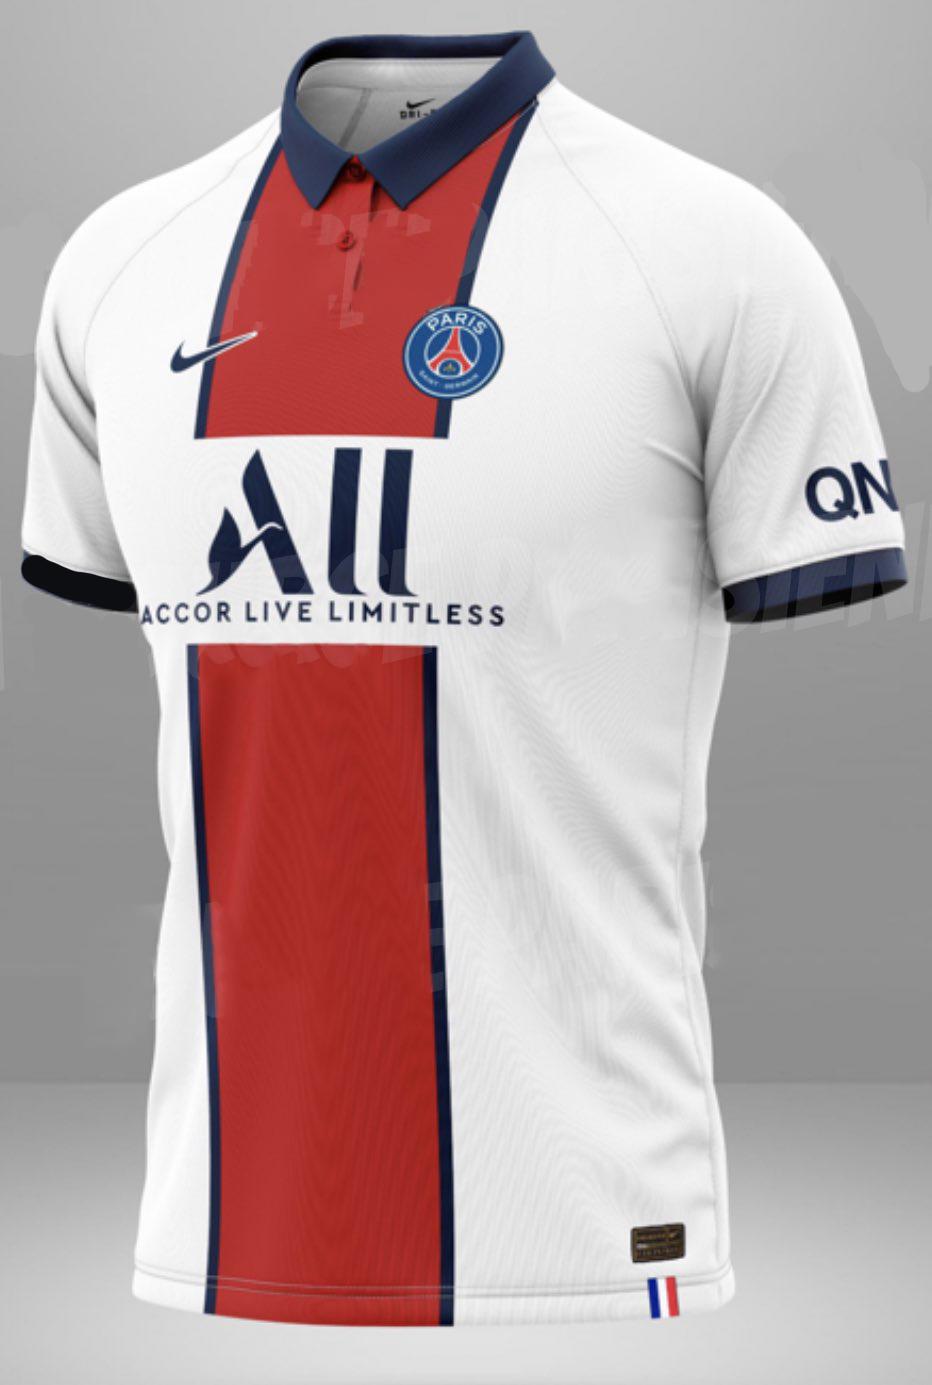 طرح احتمالی لباس دوم پاریس 2021